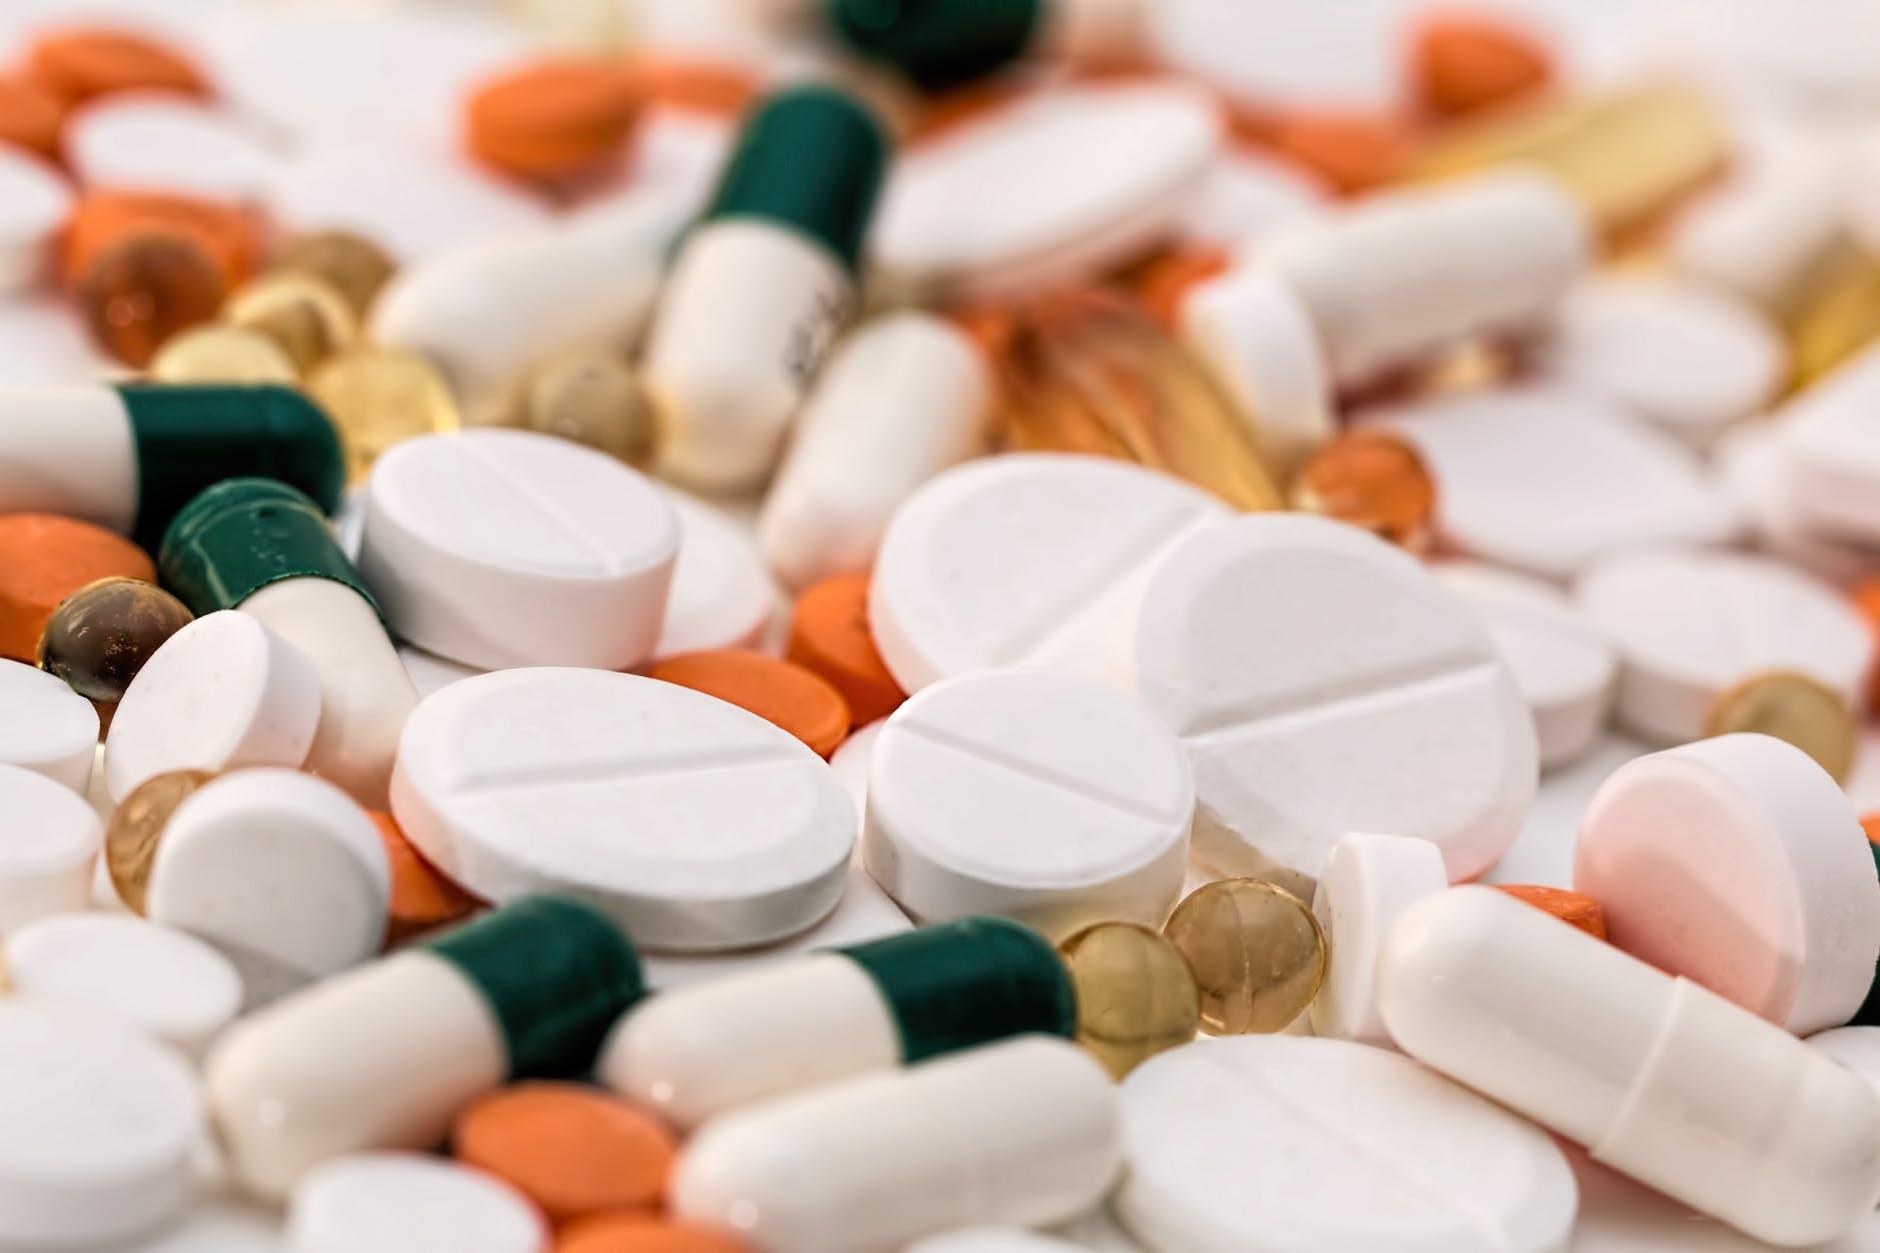 placeboeffekt i träning